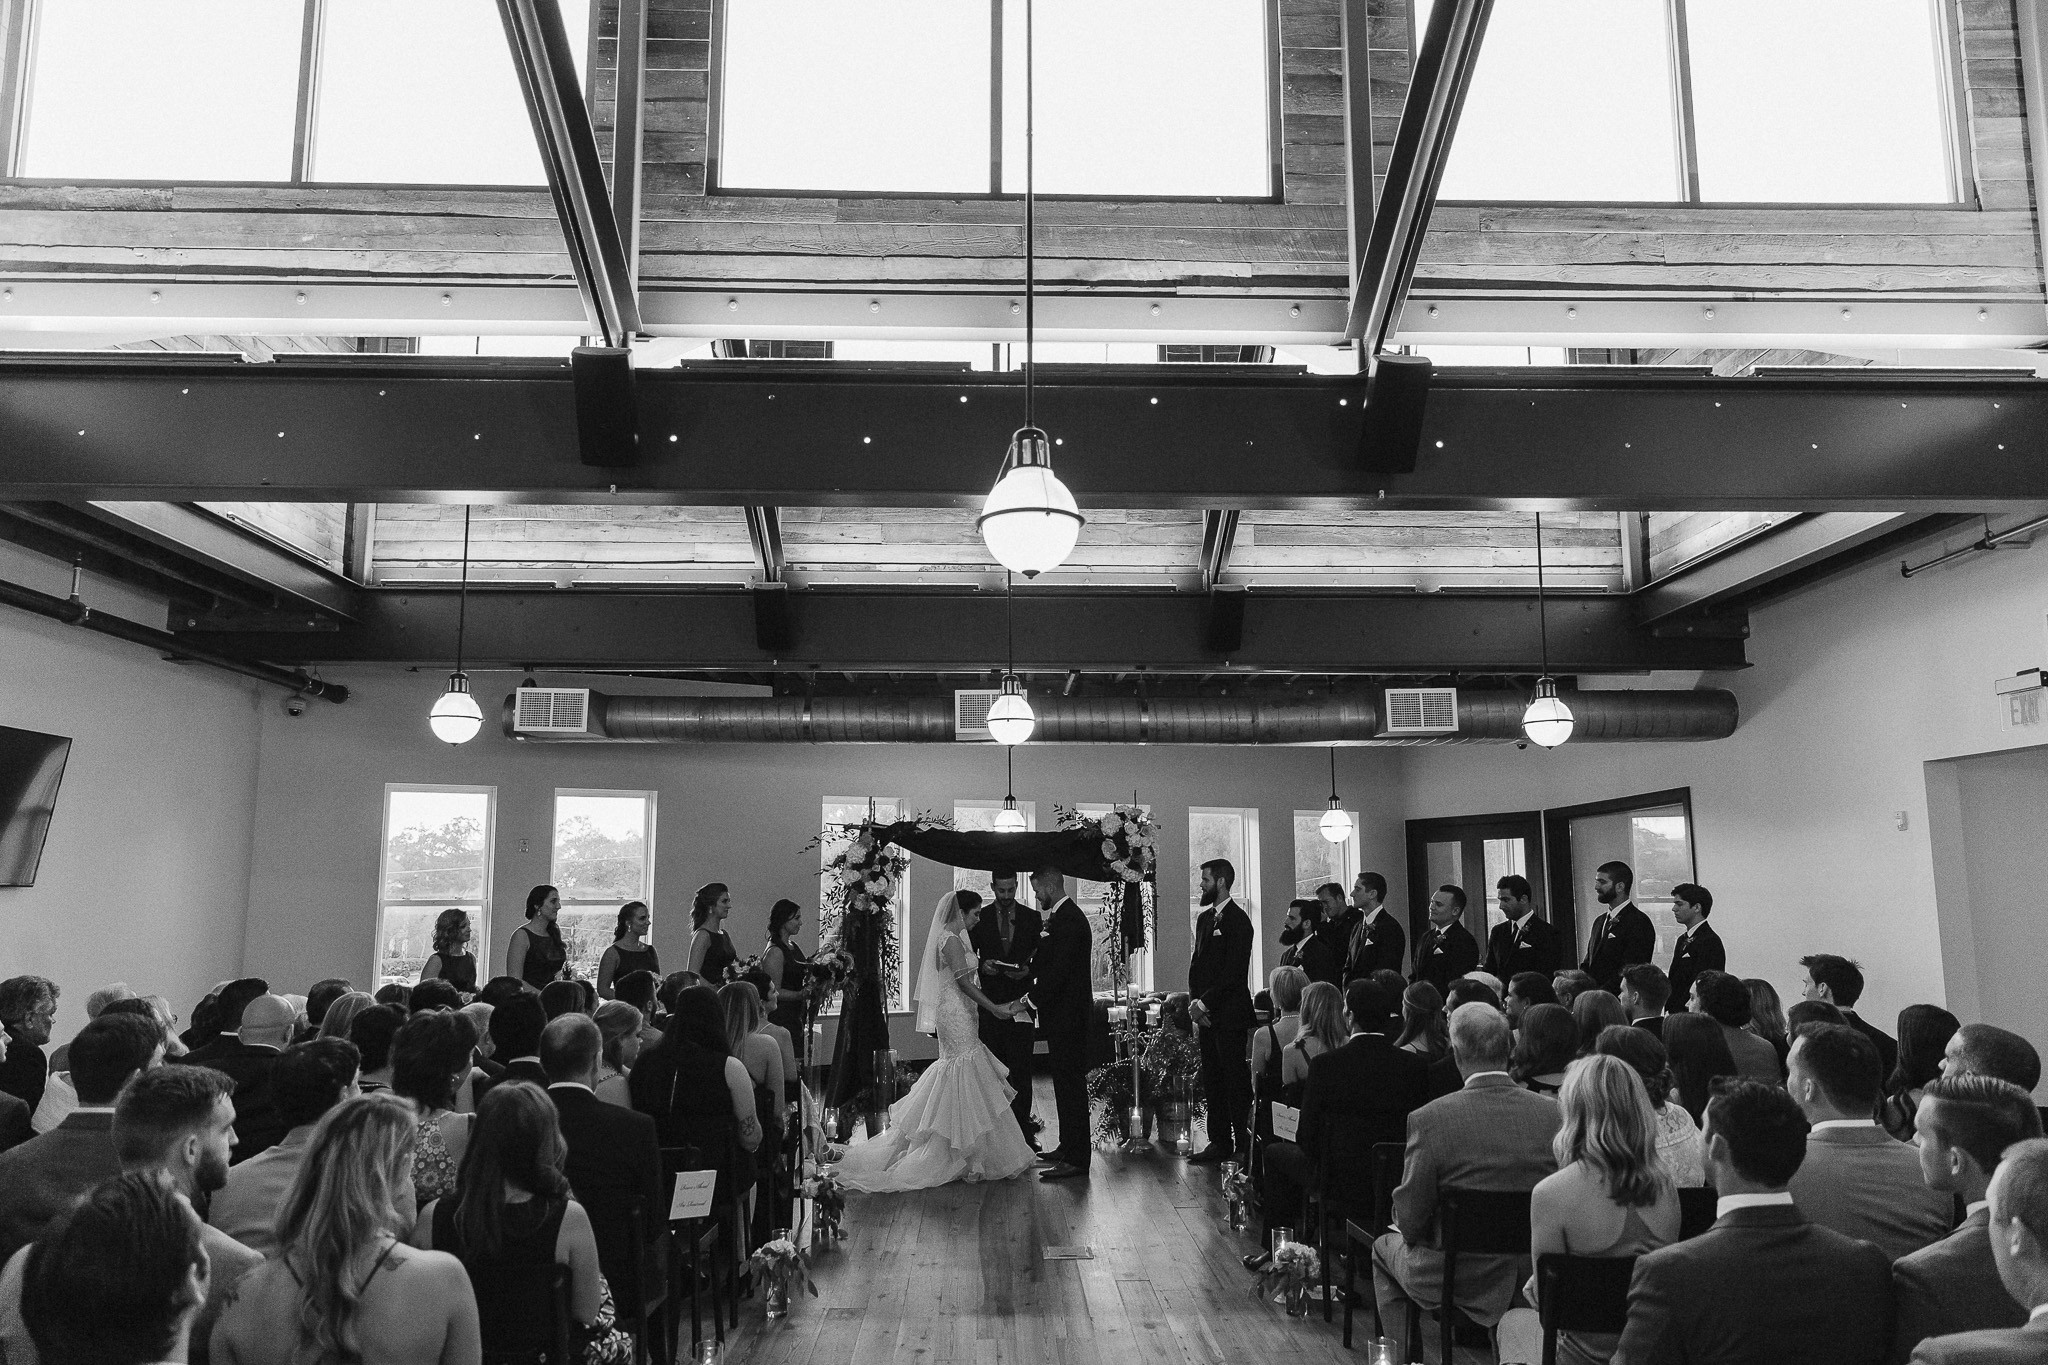 Oxford Exchange Industrial Evening Wedding Tampa Florida